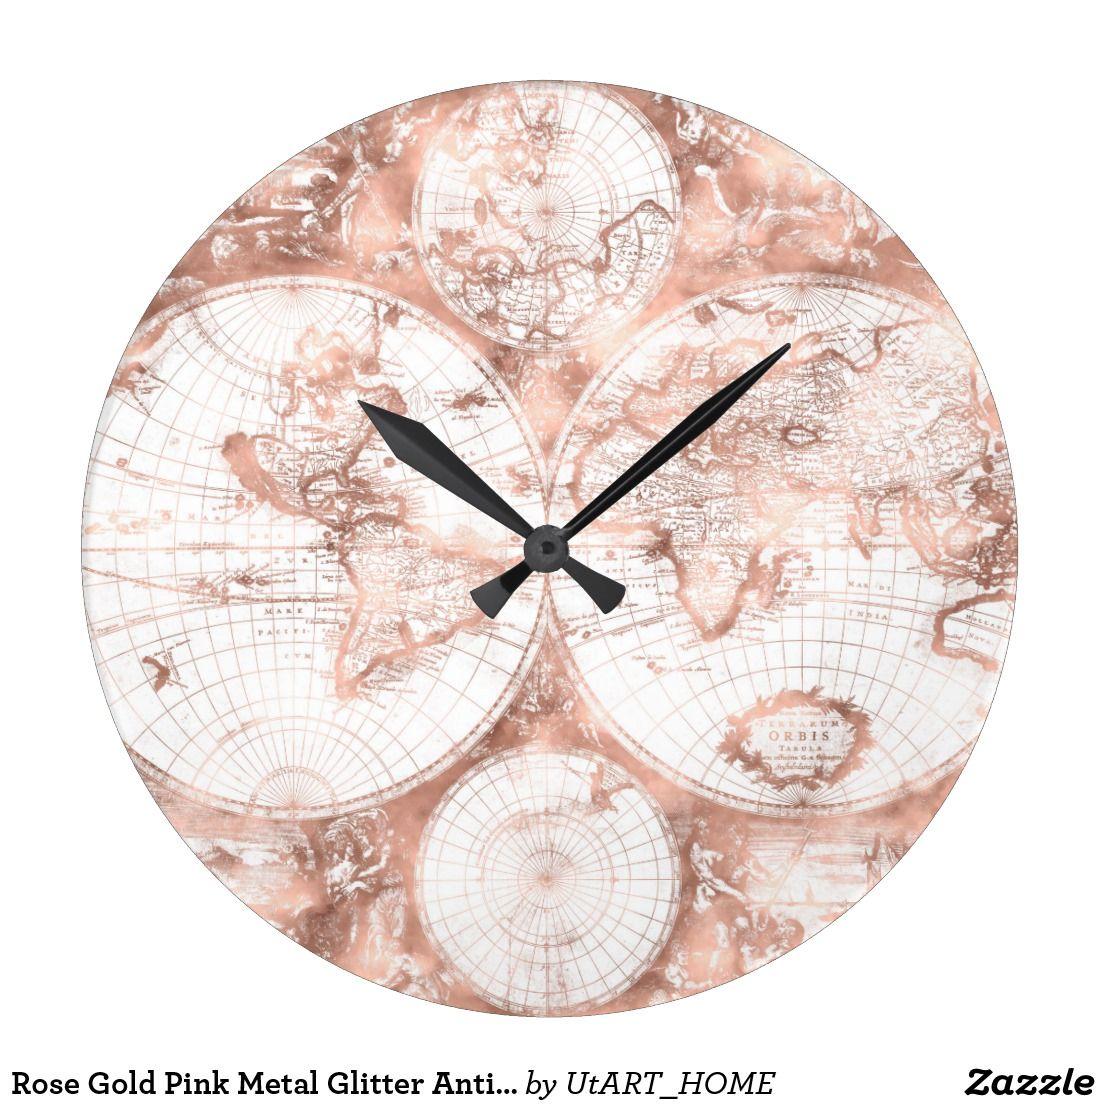 Rose Gold Pink Metal Glitter Antique World Map Square Wall Clock Zazzle Com In 2020 Wall Clock Square Wall Clock Clock